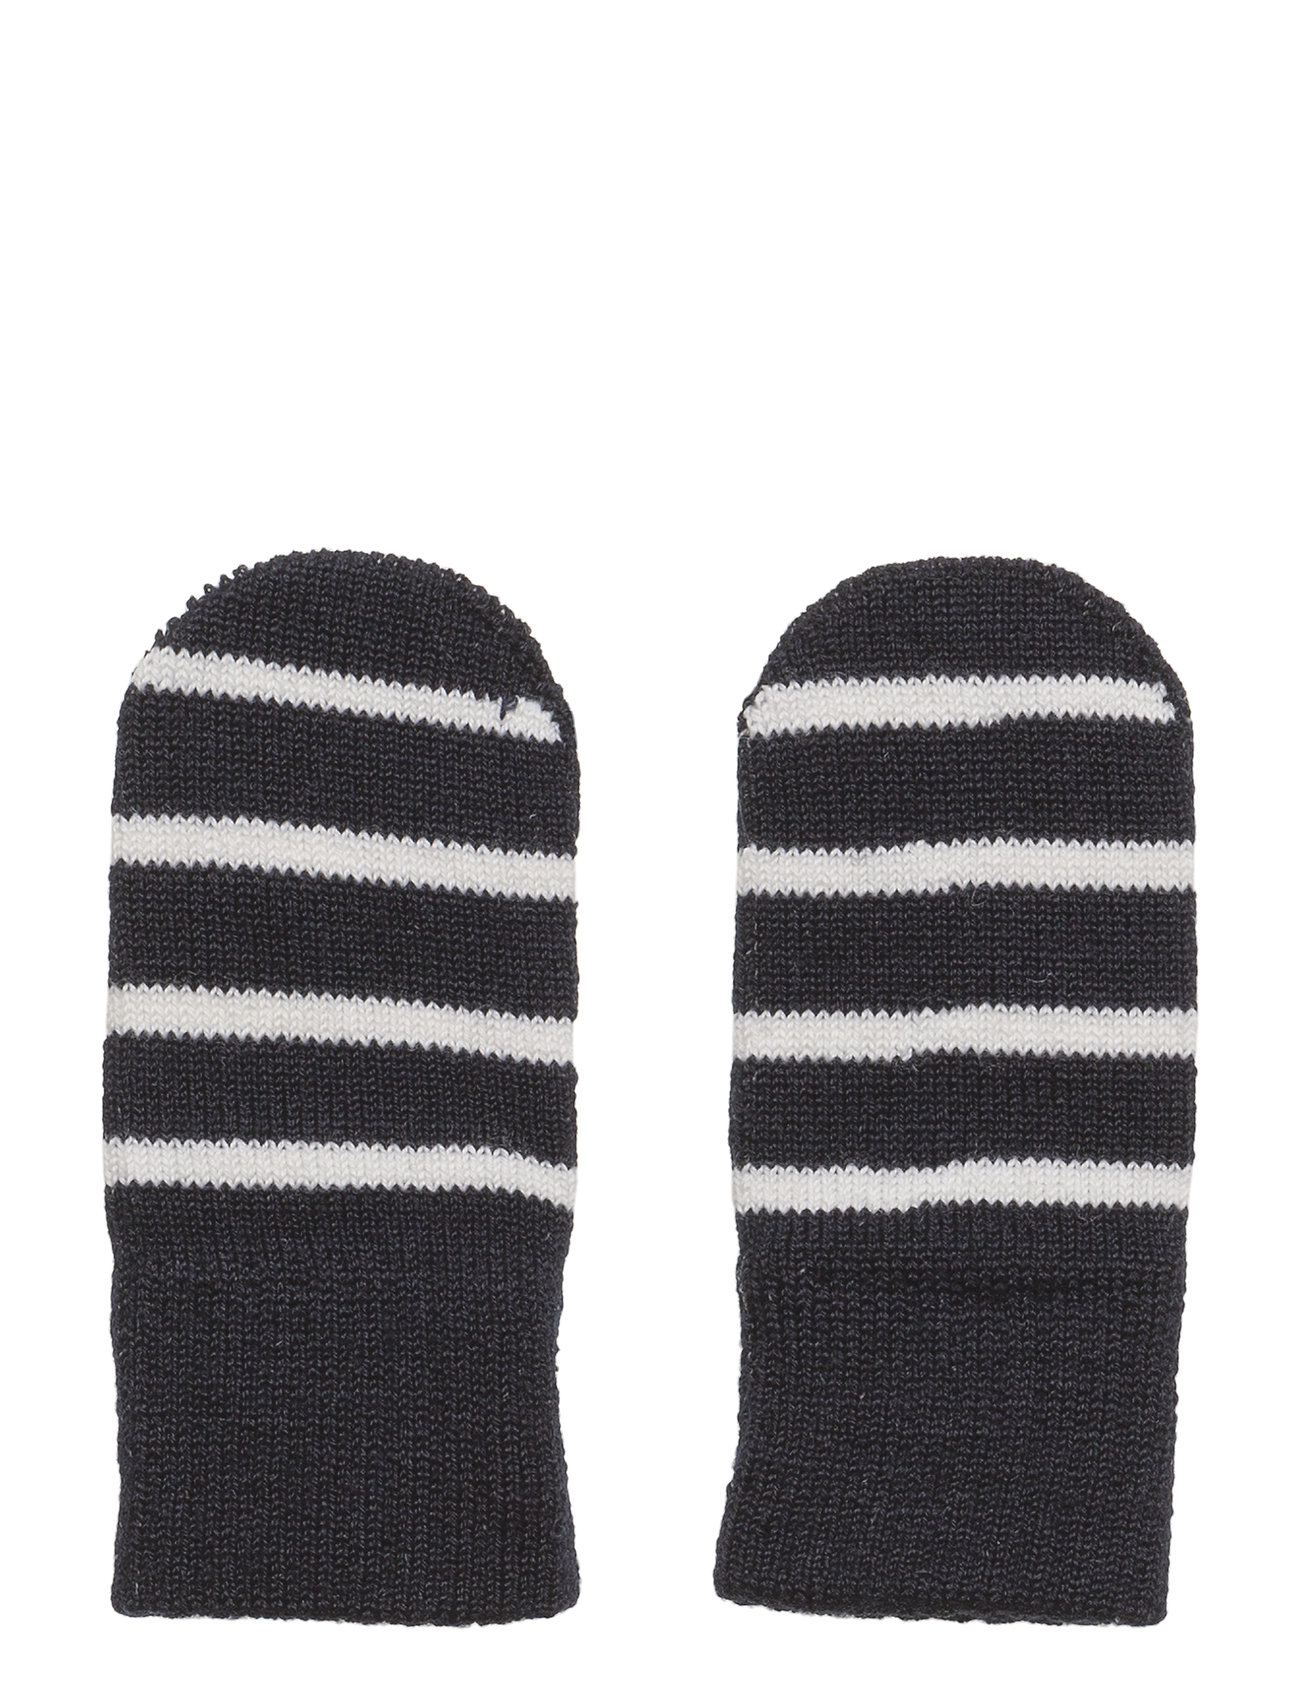 Polarn O. Pyret Mitten Wool PO.P Stripe Newborn